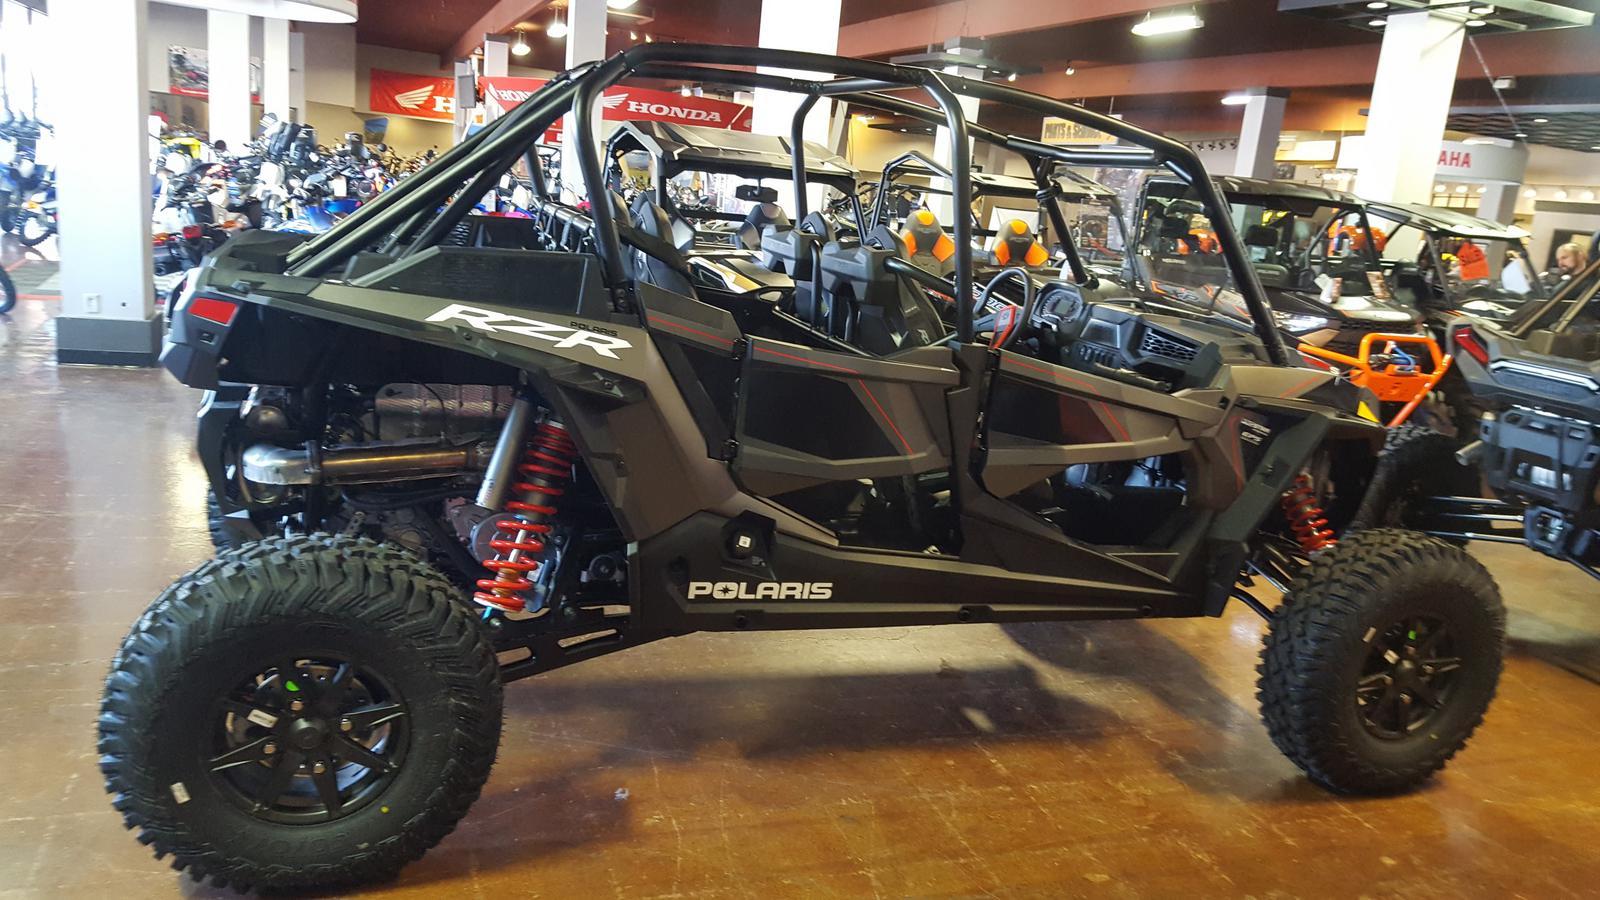 2019 Polaris Industries RZR XP 4 Turbo S Velocity - Titanium Metallic